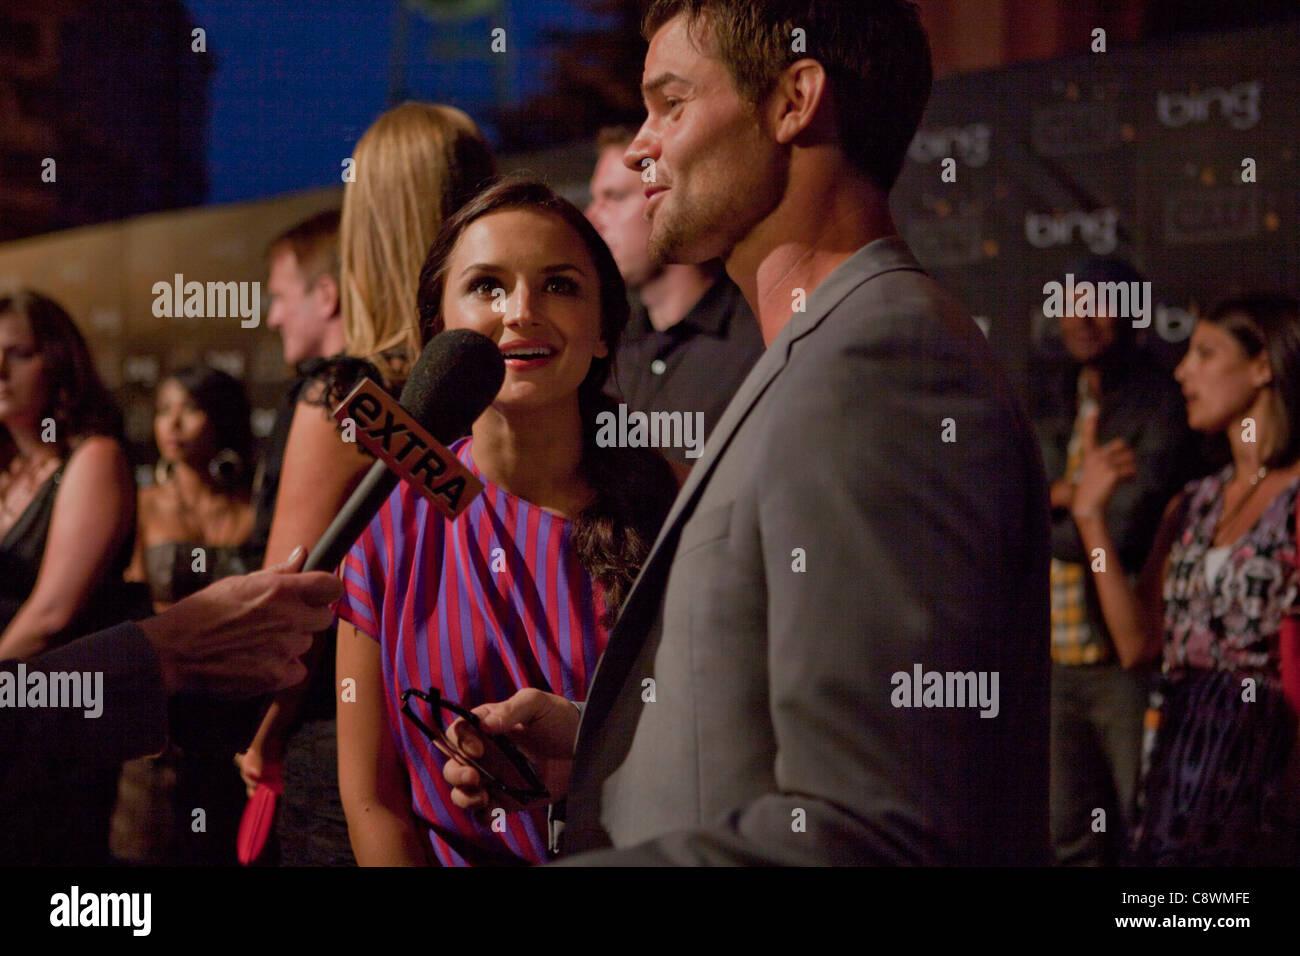 Rachael Leigh Cook Daniel Gillies arrivals Bing PresentsCW Premiere Party Steven J Ross Theater Burbank CA September - Stock Image